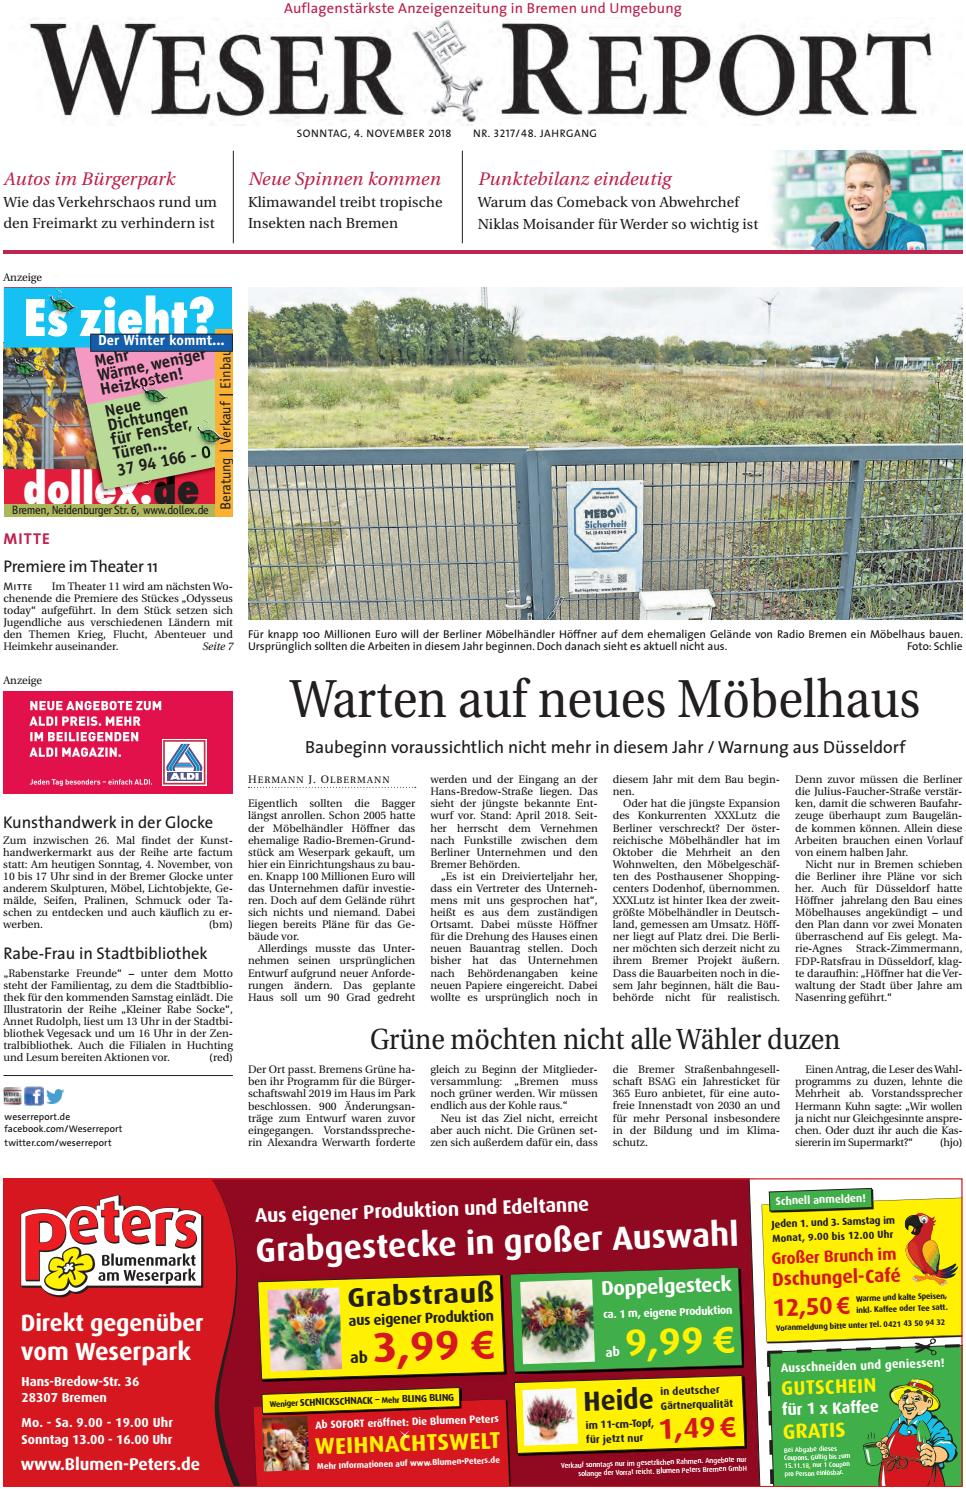 Weser Report Mitte vom 04.11.2018 by KPS